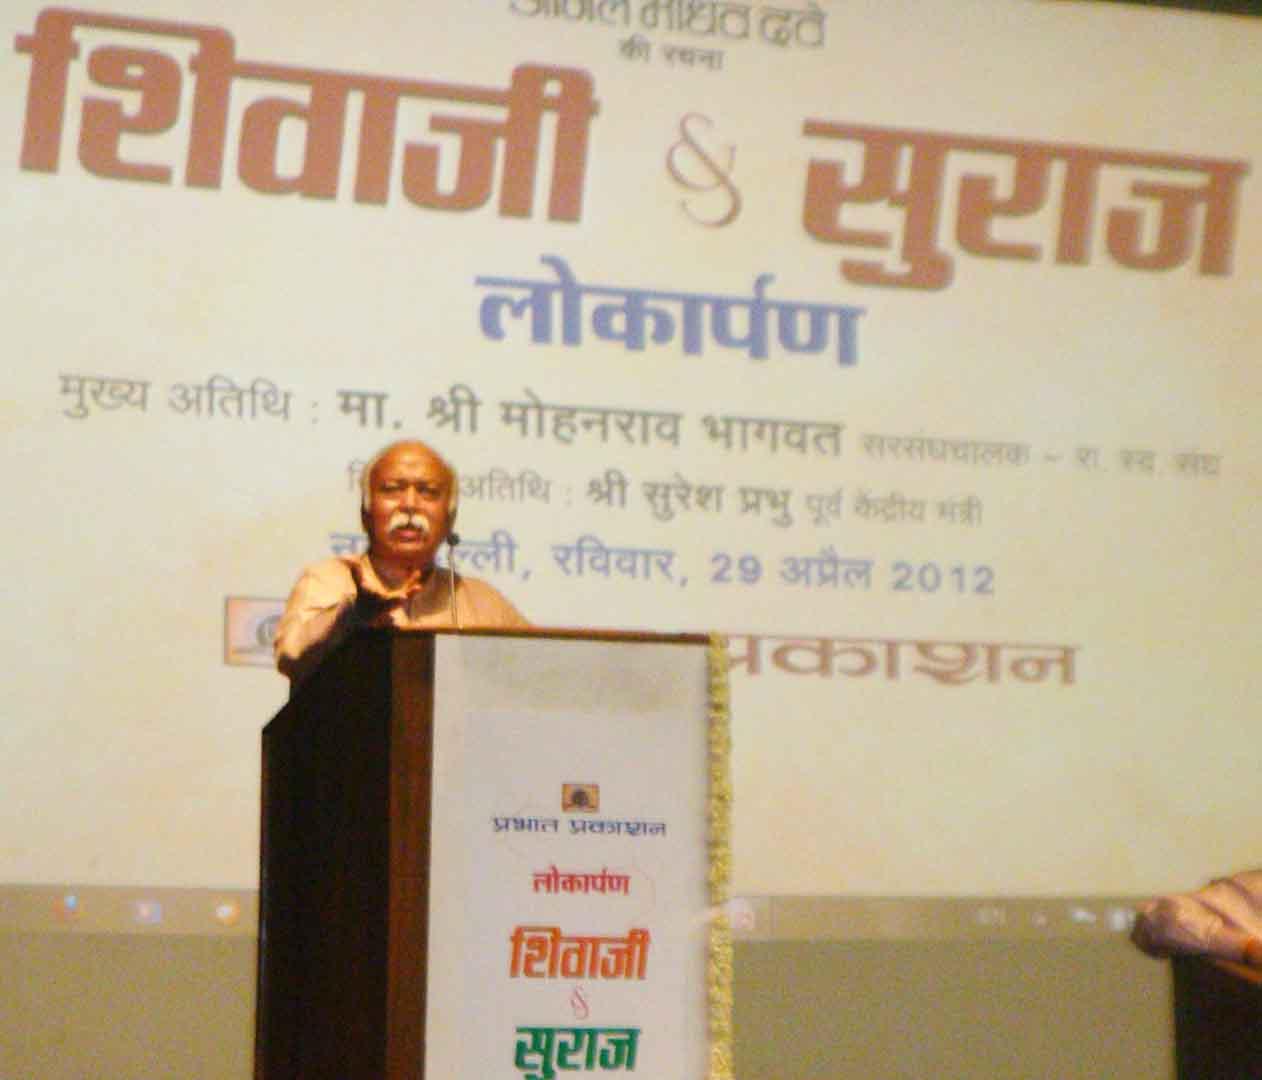 Chhatrapati Shivaji: A visionary and guiding light' says RSS